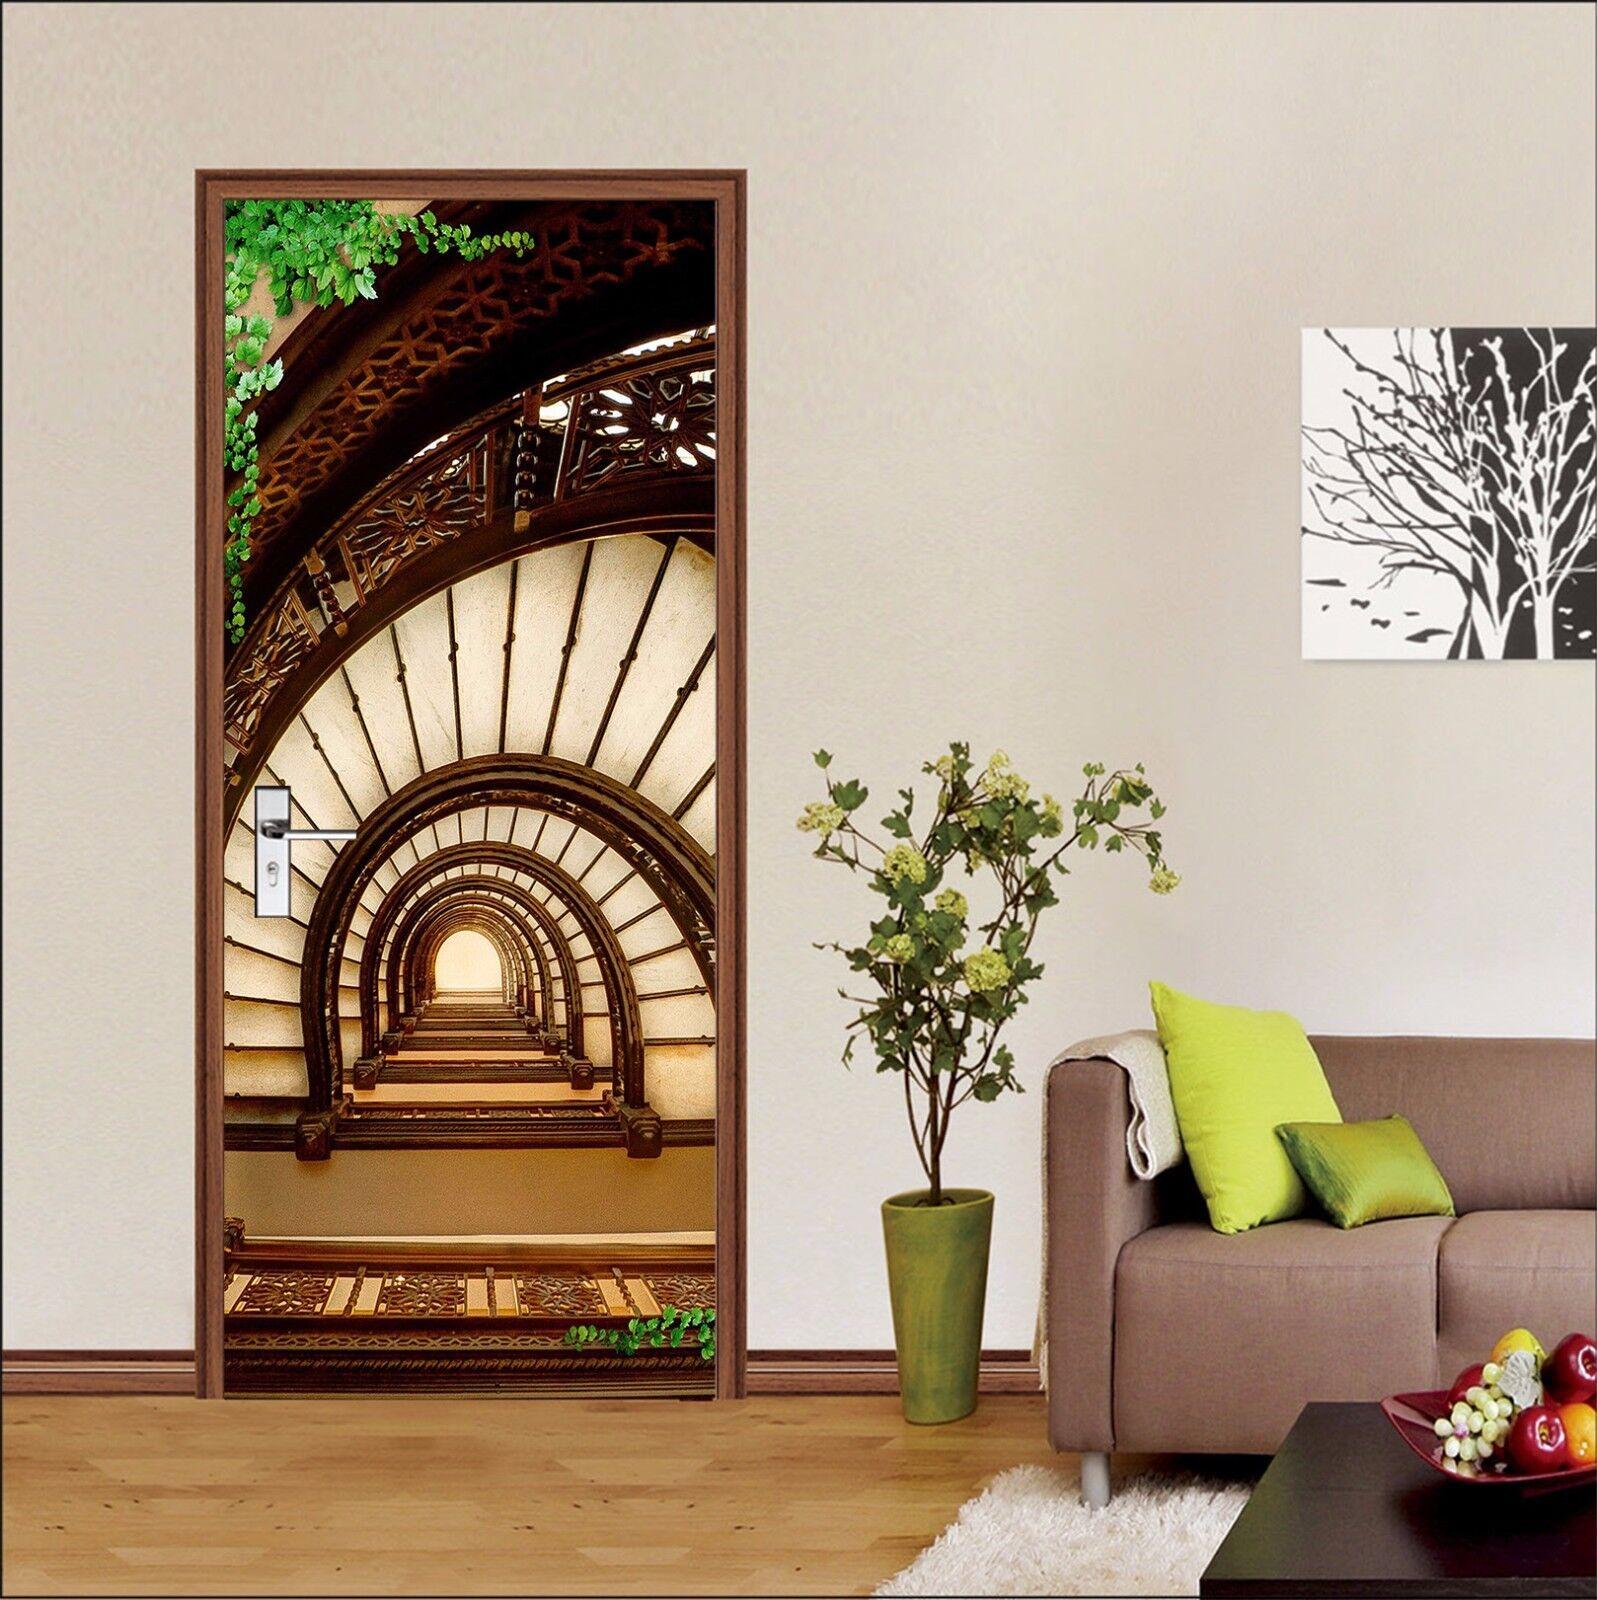 3D Bogen 89 Tür Wandmalerei Wandmalerei Wandmalerei Wandaufkleber Aufkleber AJ WALLPAPER DE Kyra   Haltbarkeit    Meistverkaufte weltweit    Elegant  113260